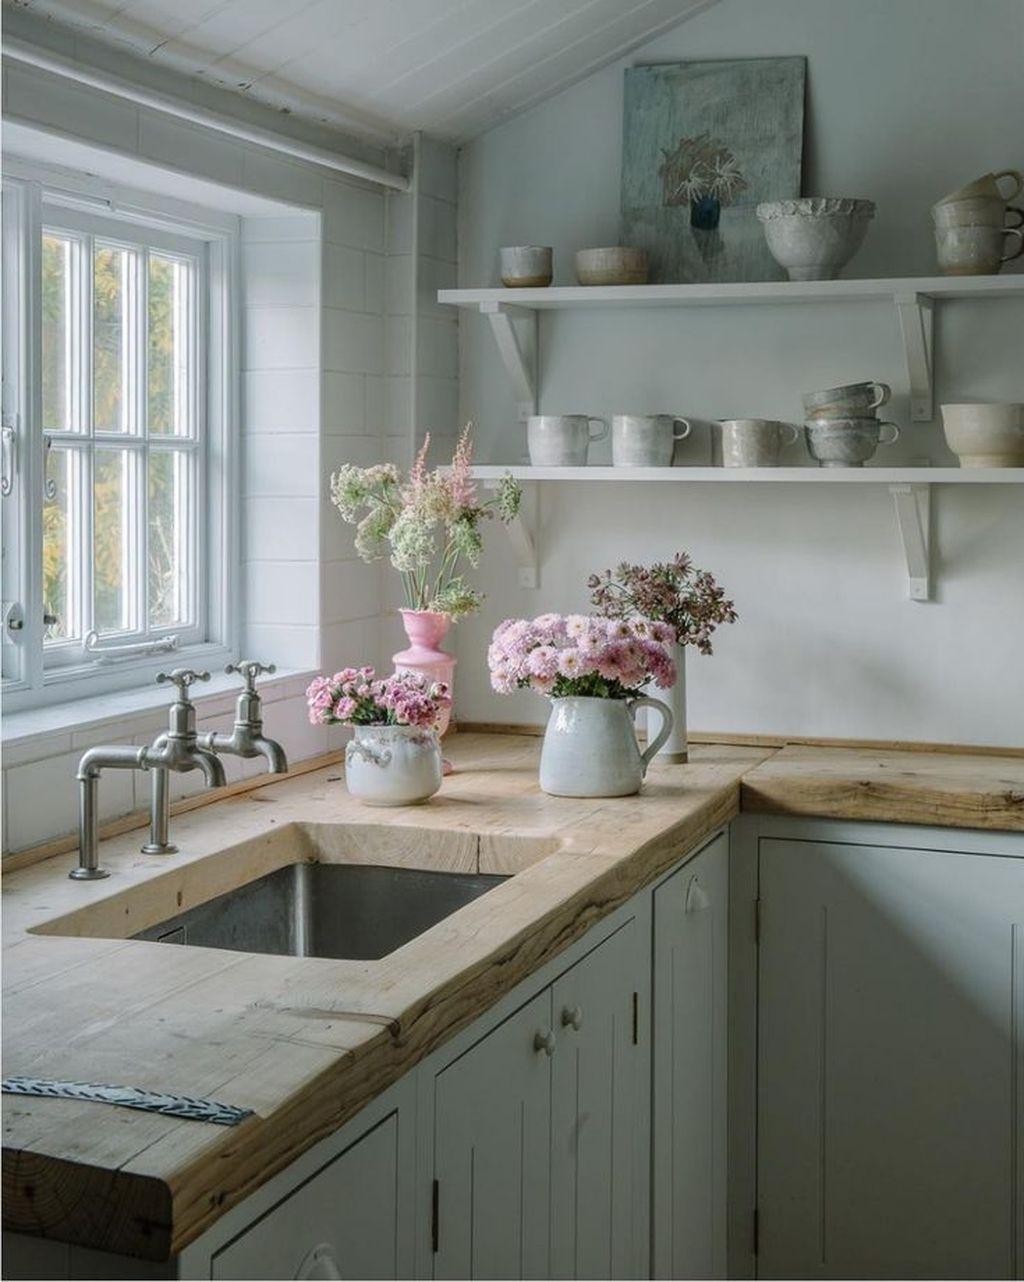 Arredamento Per Casali 38 popular traditional kitchen ideas with farmhouse style